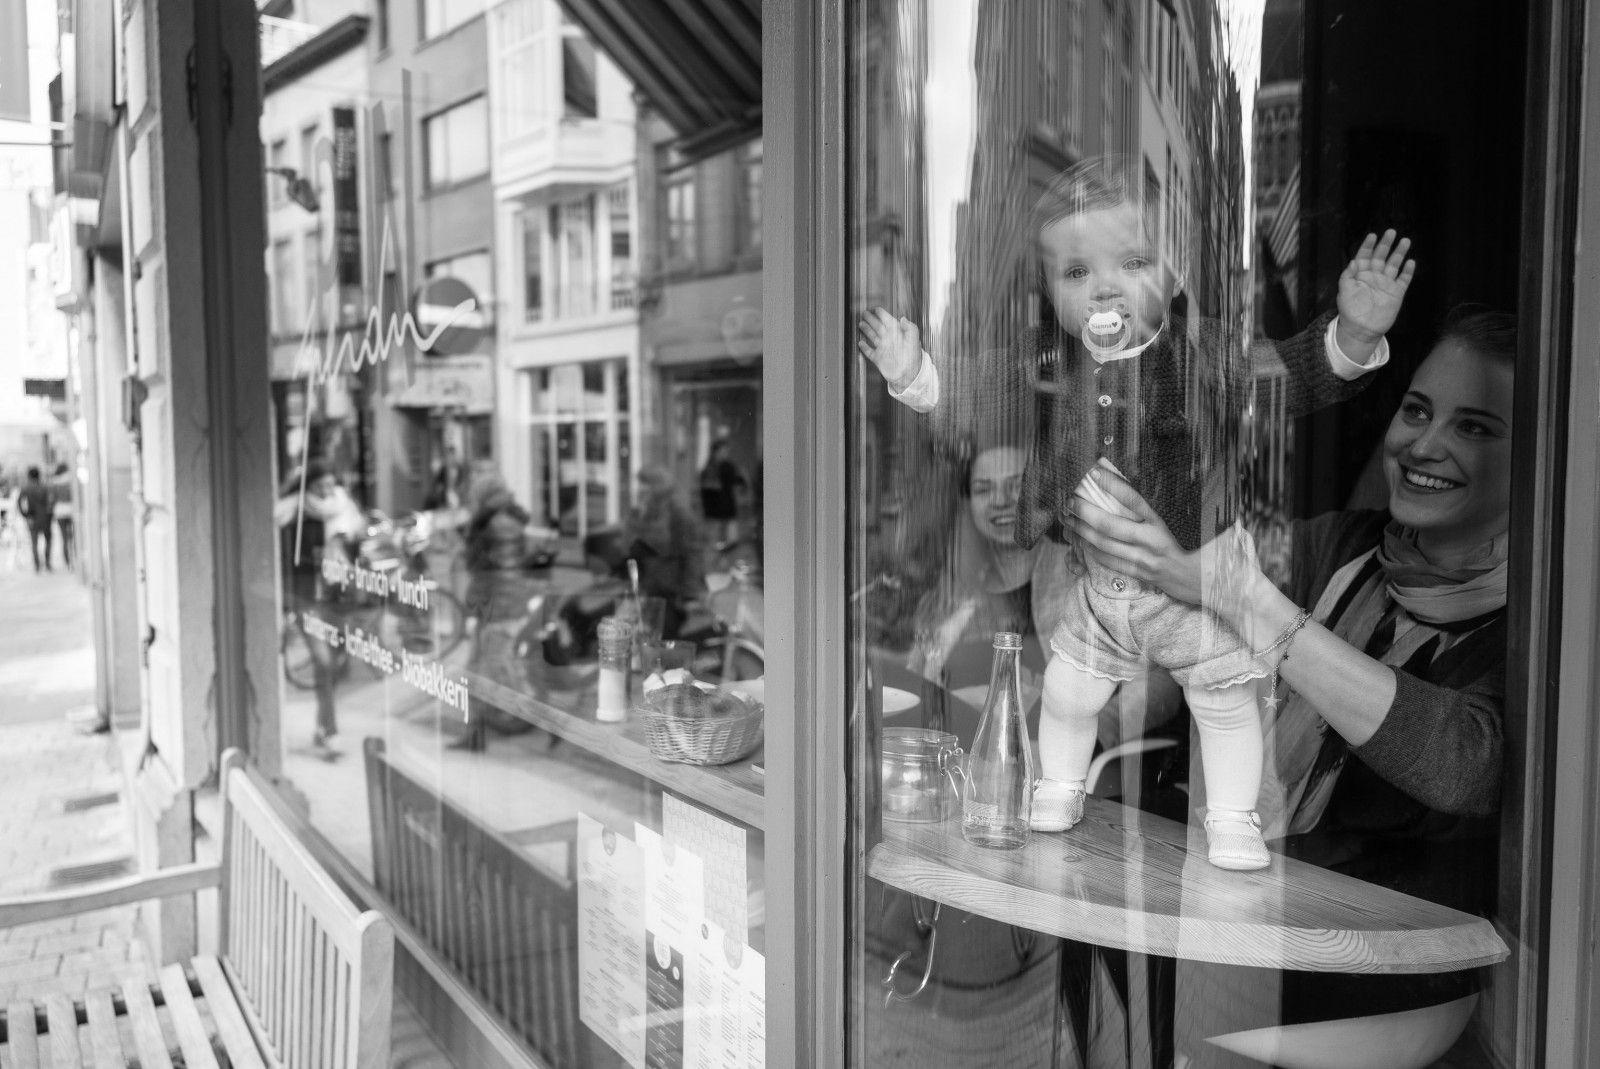 sienna_gent_belgium_child_28mm_summicron_jipvankuijk